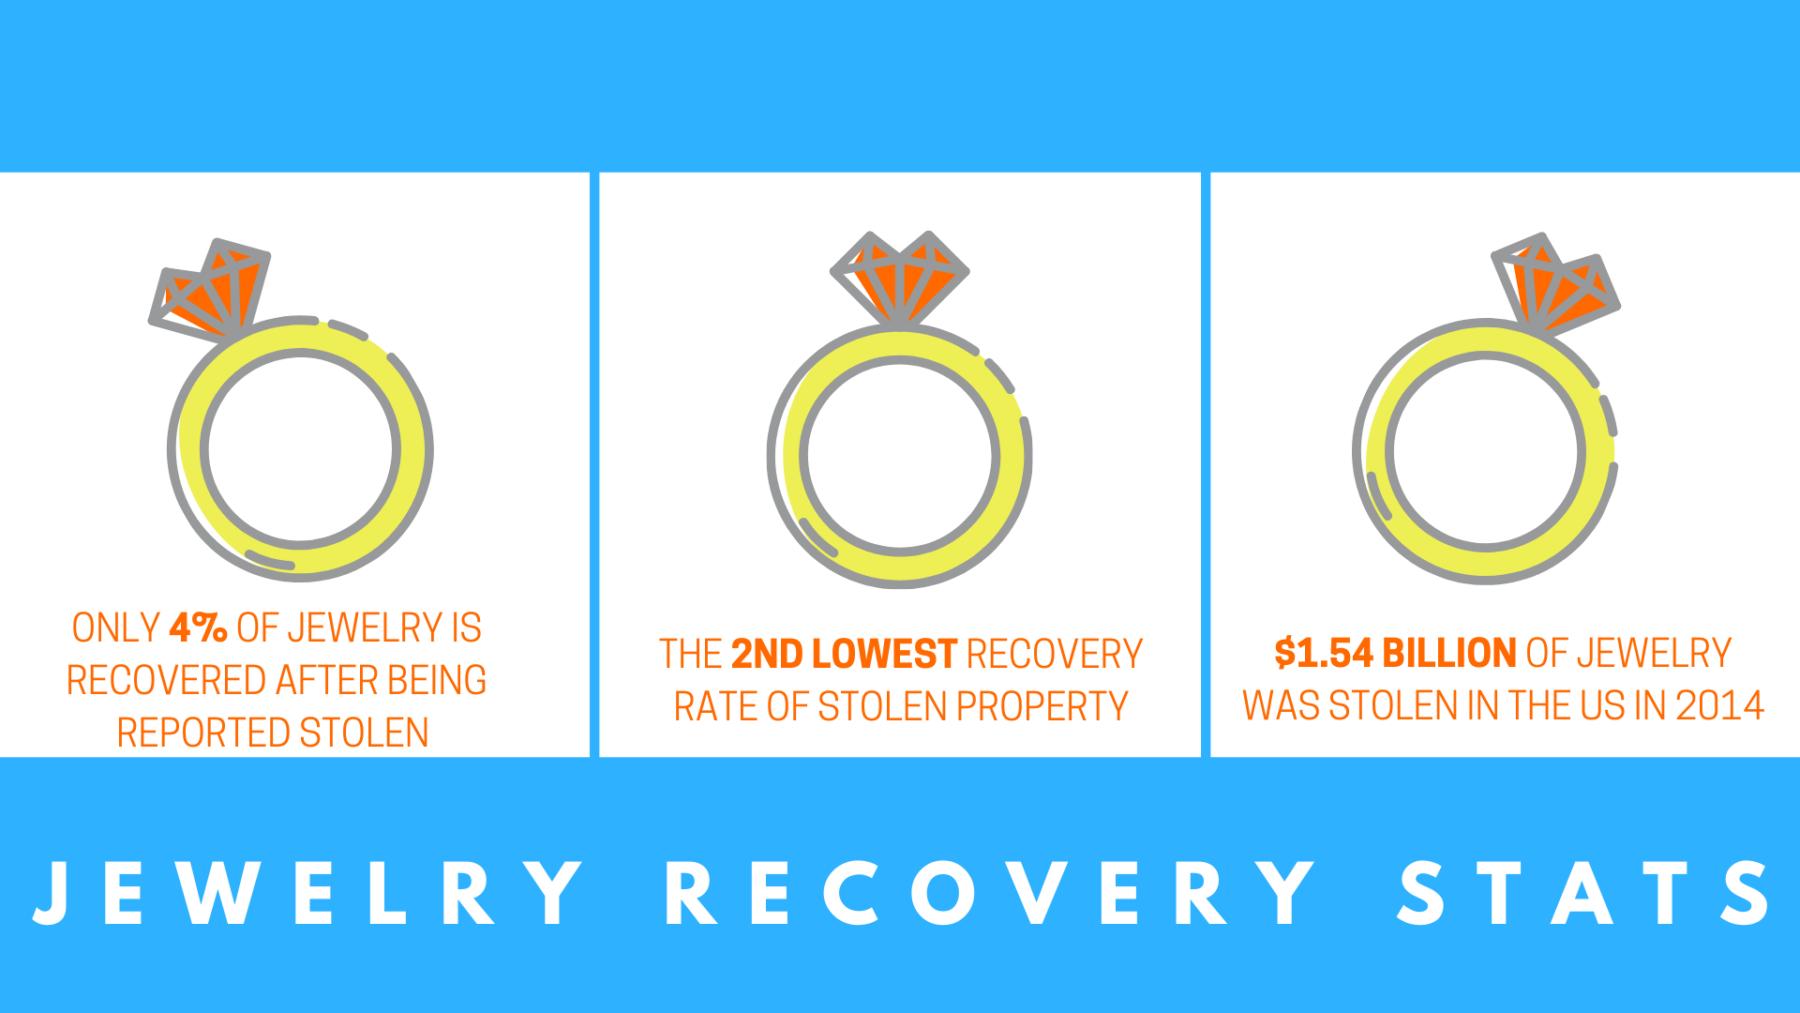 Jewelry Recovery Statistics